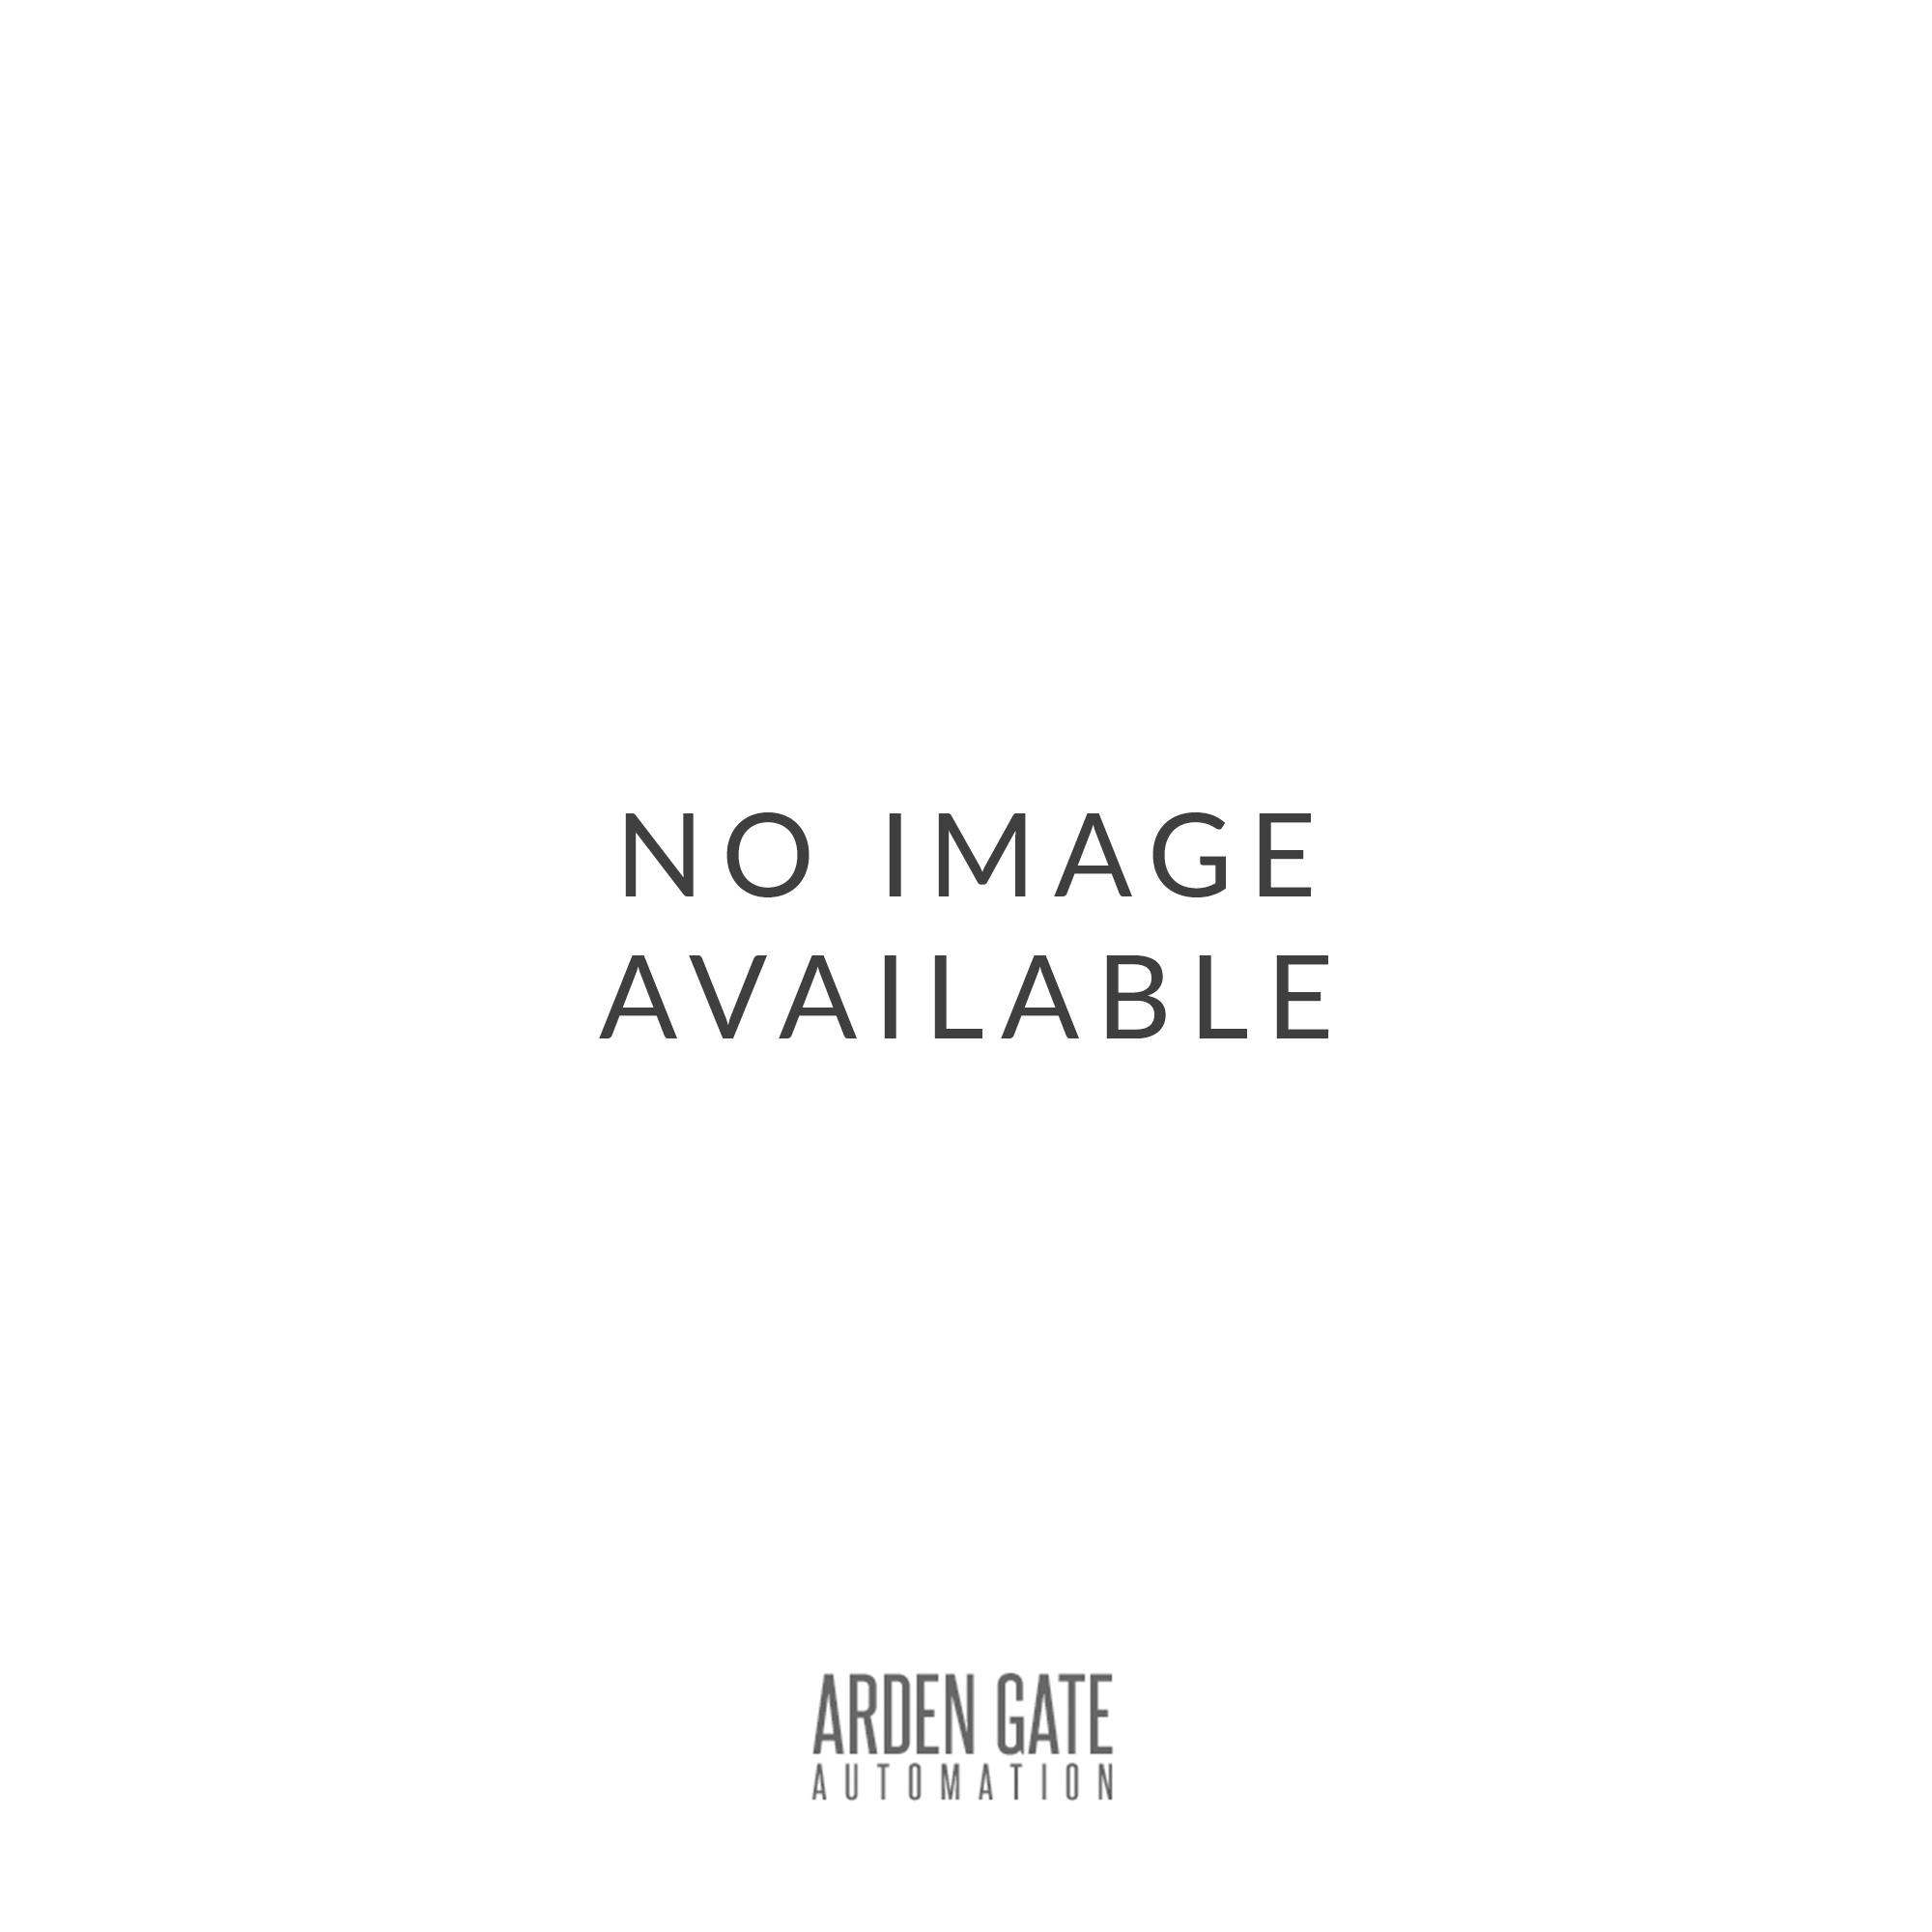 603-HF-IMPK Wireless Digital Intercom with Keypad